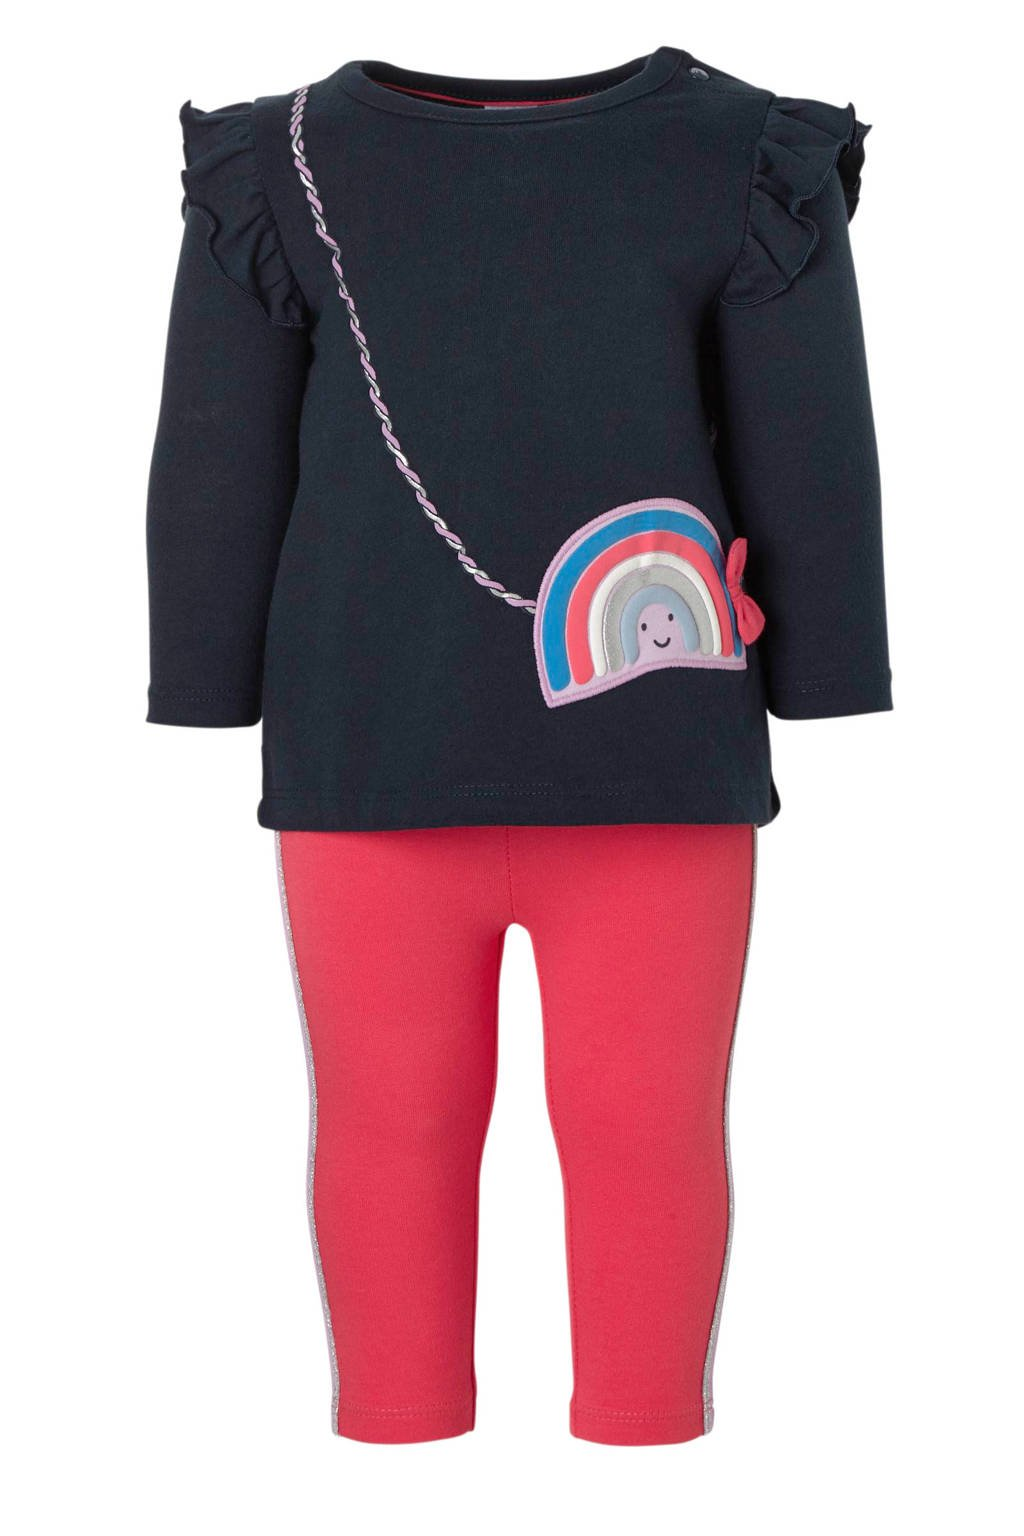 C&A Baby Club longsleeve + legging, Donkerblauw/roze